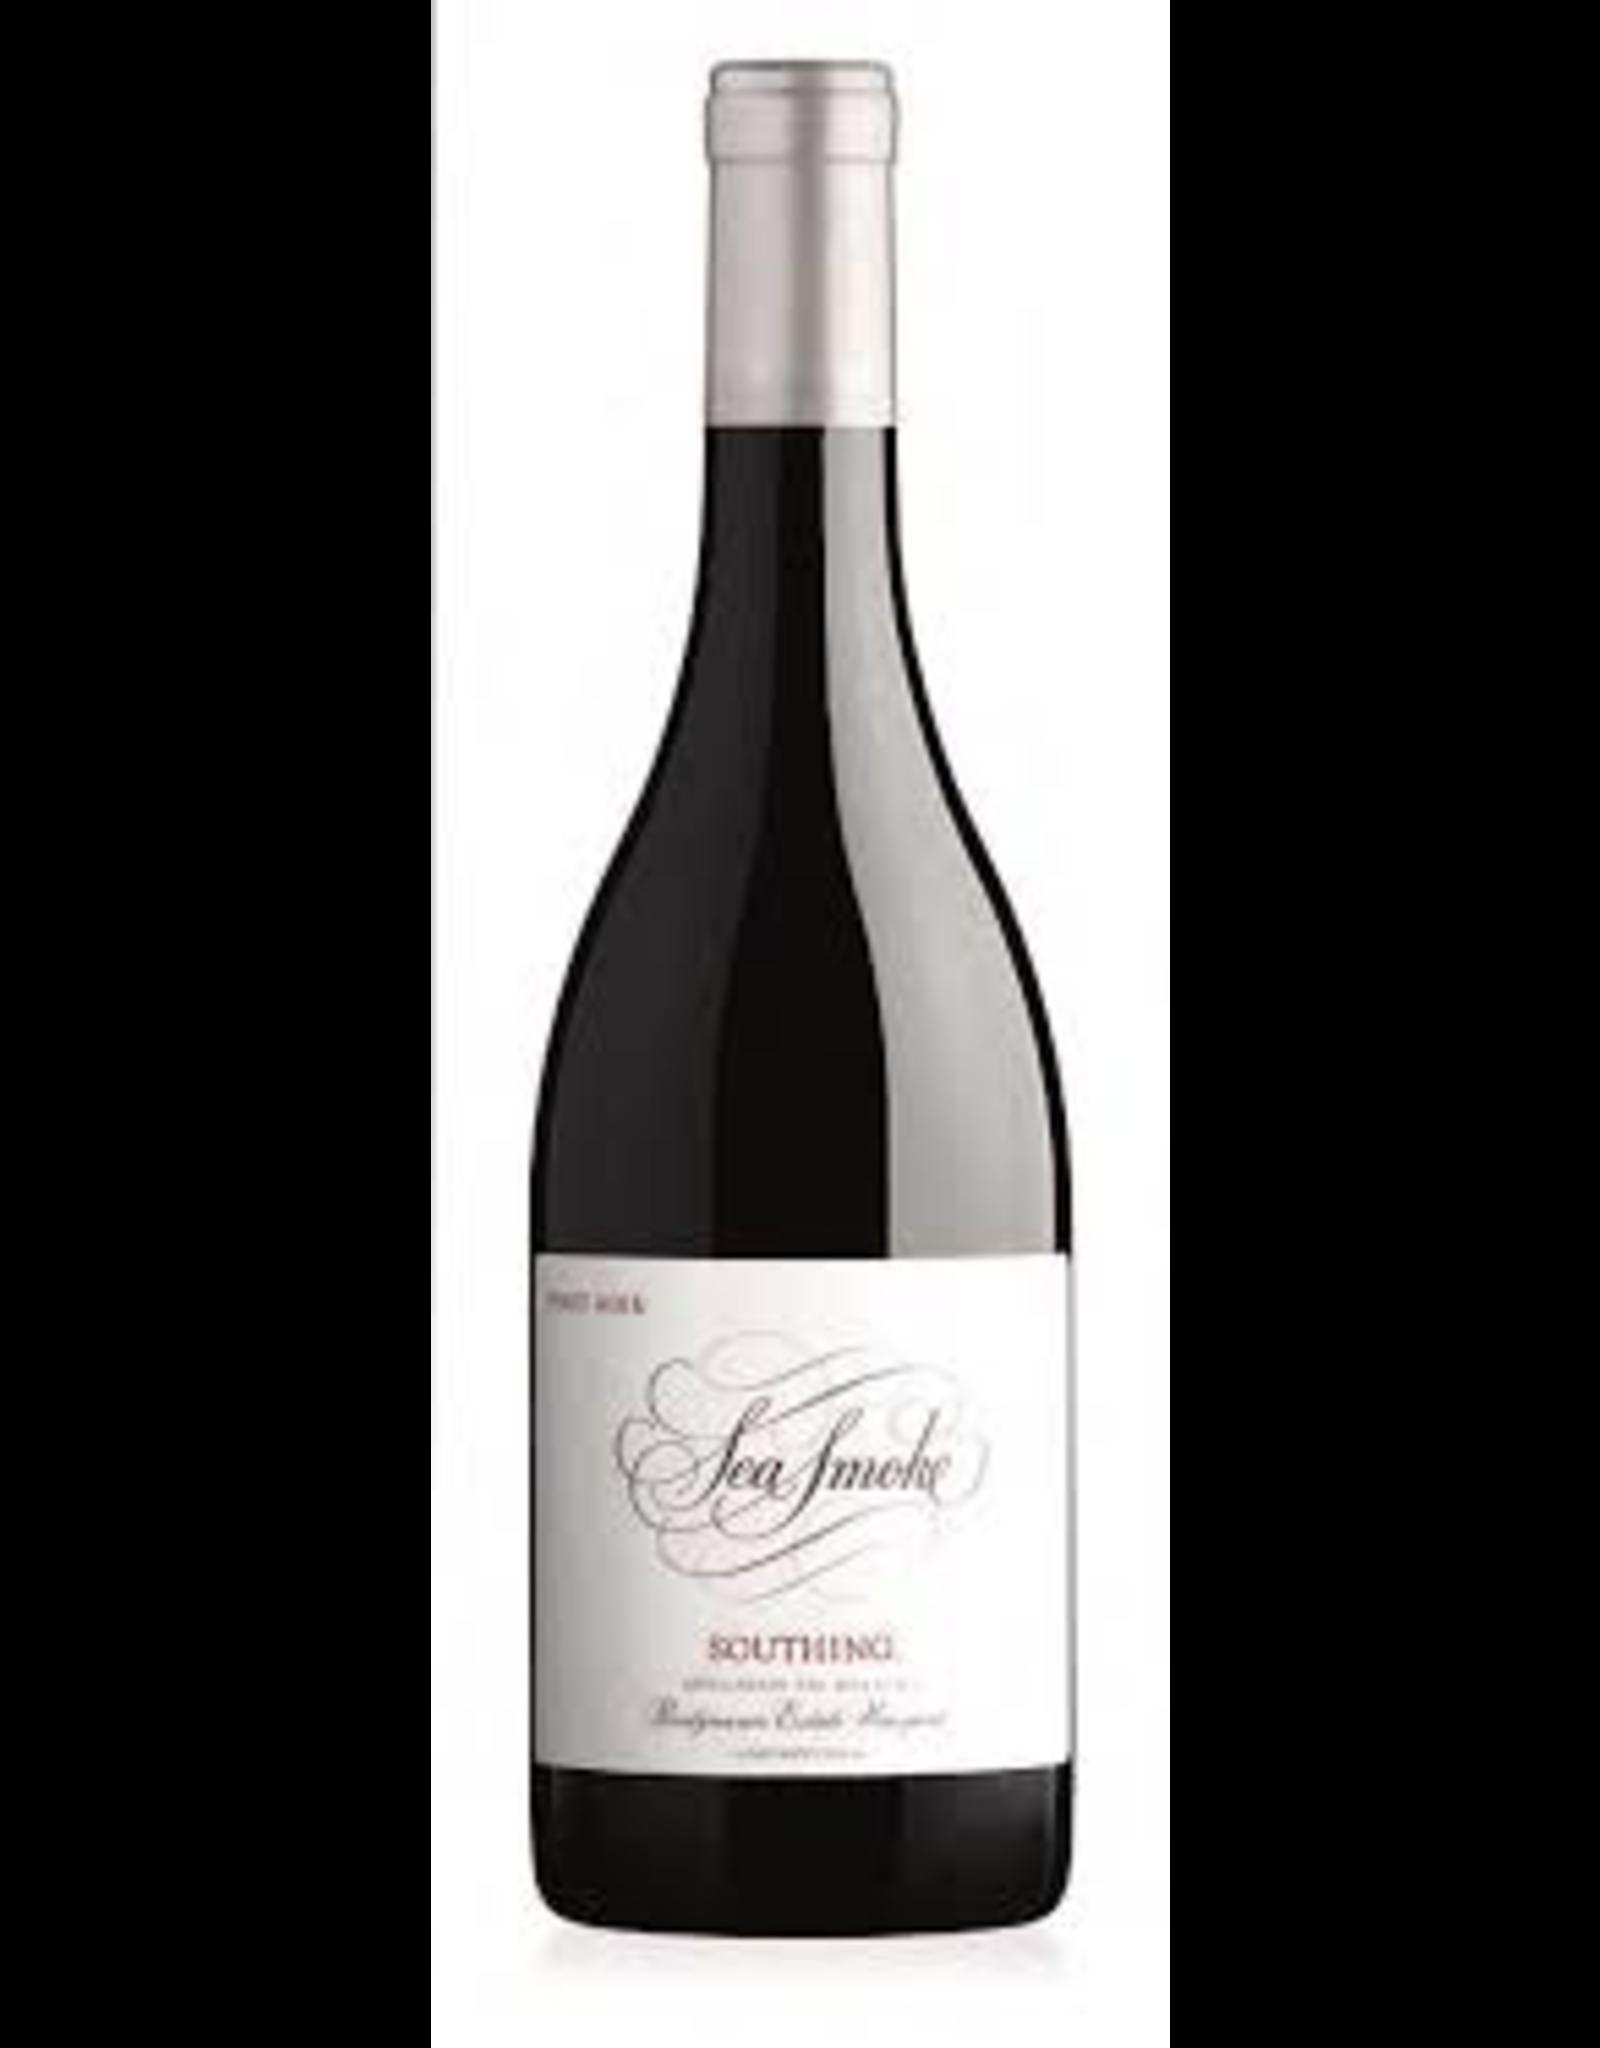 Red Wine 2016, Sea Smoke Southing, Pinot Noir, Sta. Rita Hills, Central Coast, California, 14.5% Alc, CT